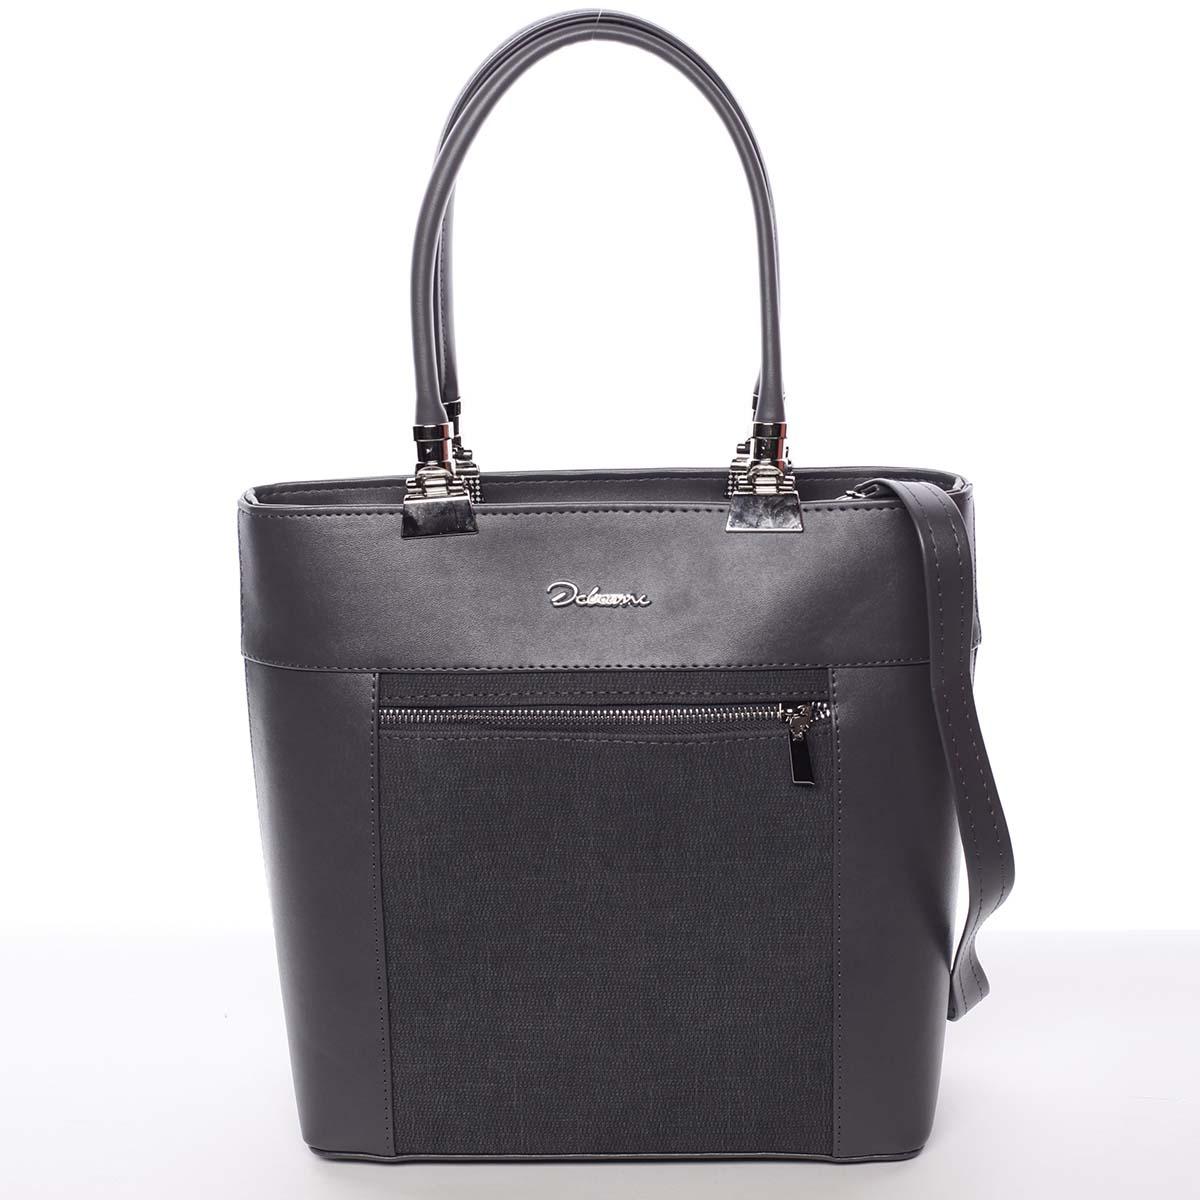 Elegantná dámska kabelka šedá - Delami Kassandra šedá